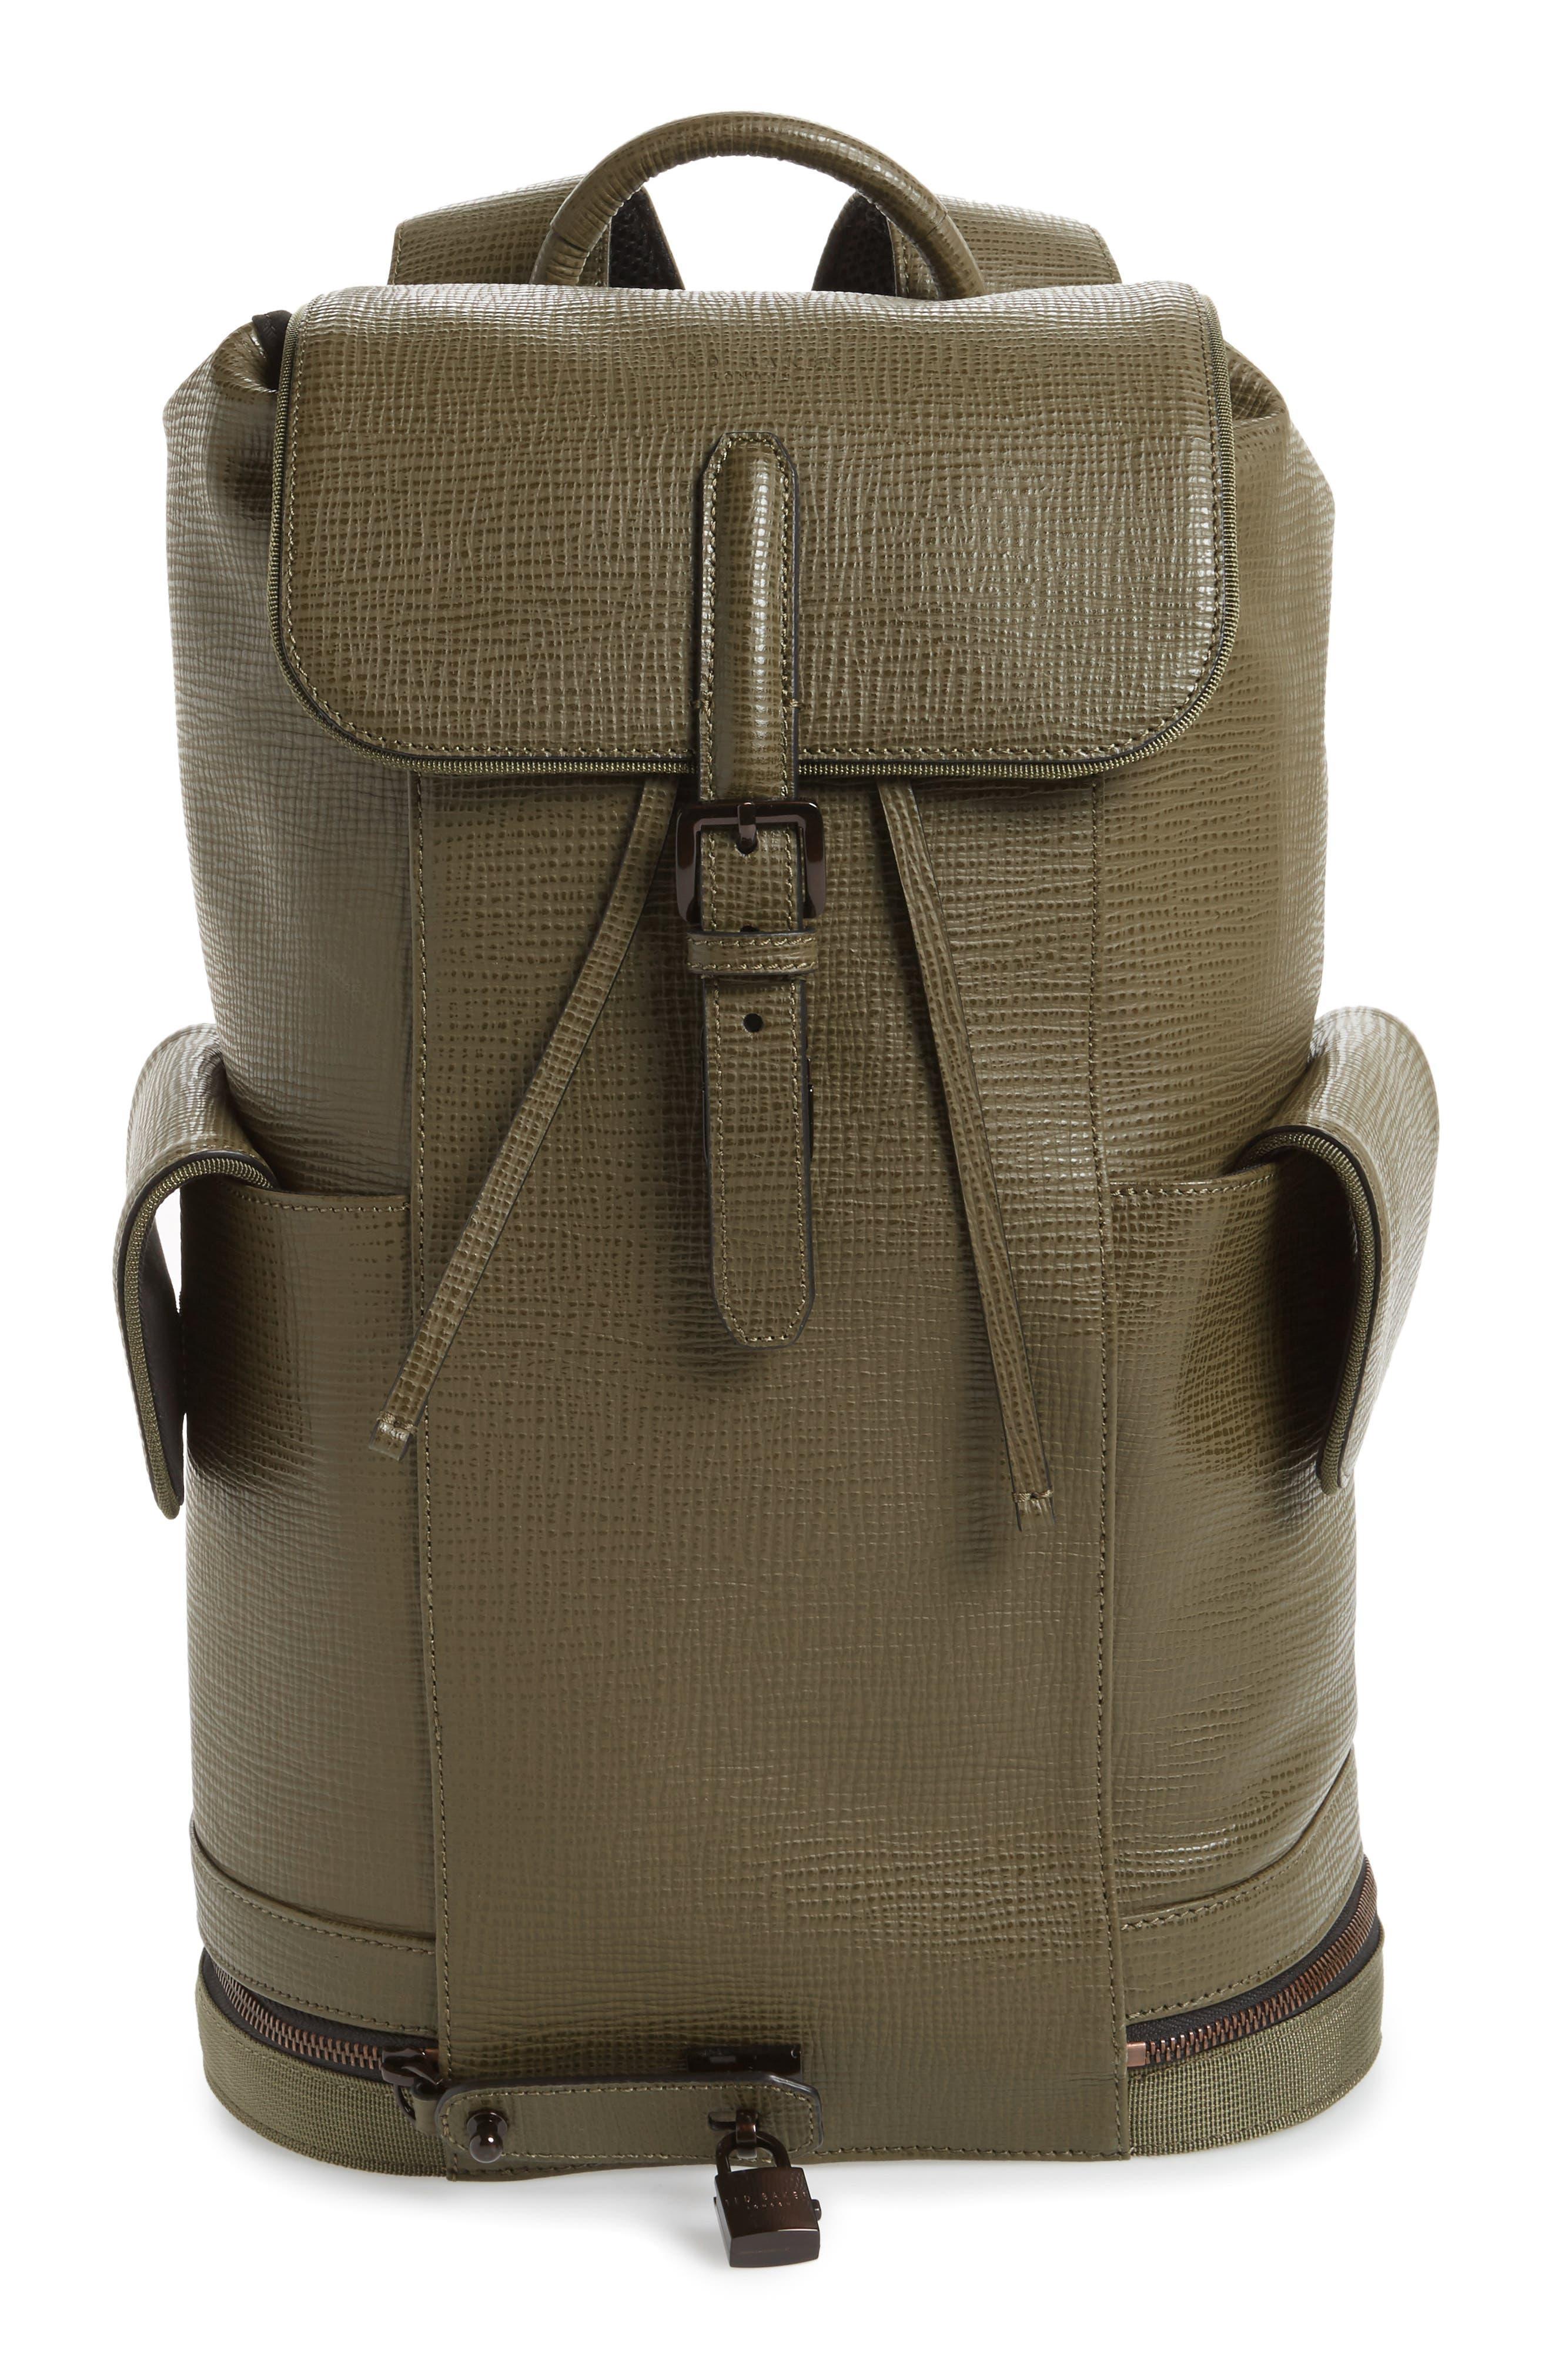 Thorr Palmelato Backpack,                         Main,                         color,